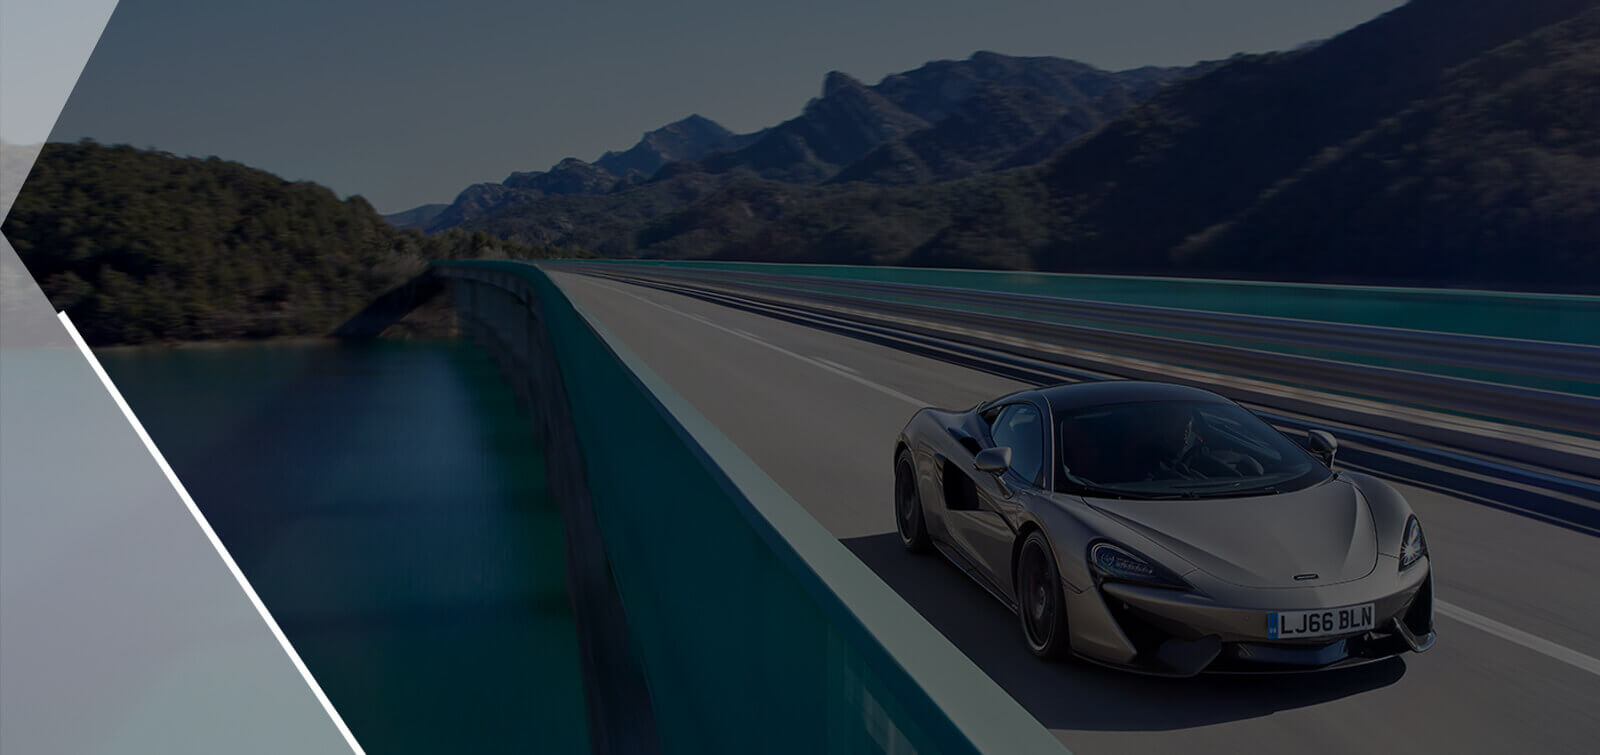 1 Exotic Car Rentals In Las Vegas Unlimited Miles Free Gas